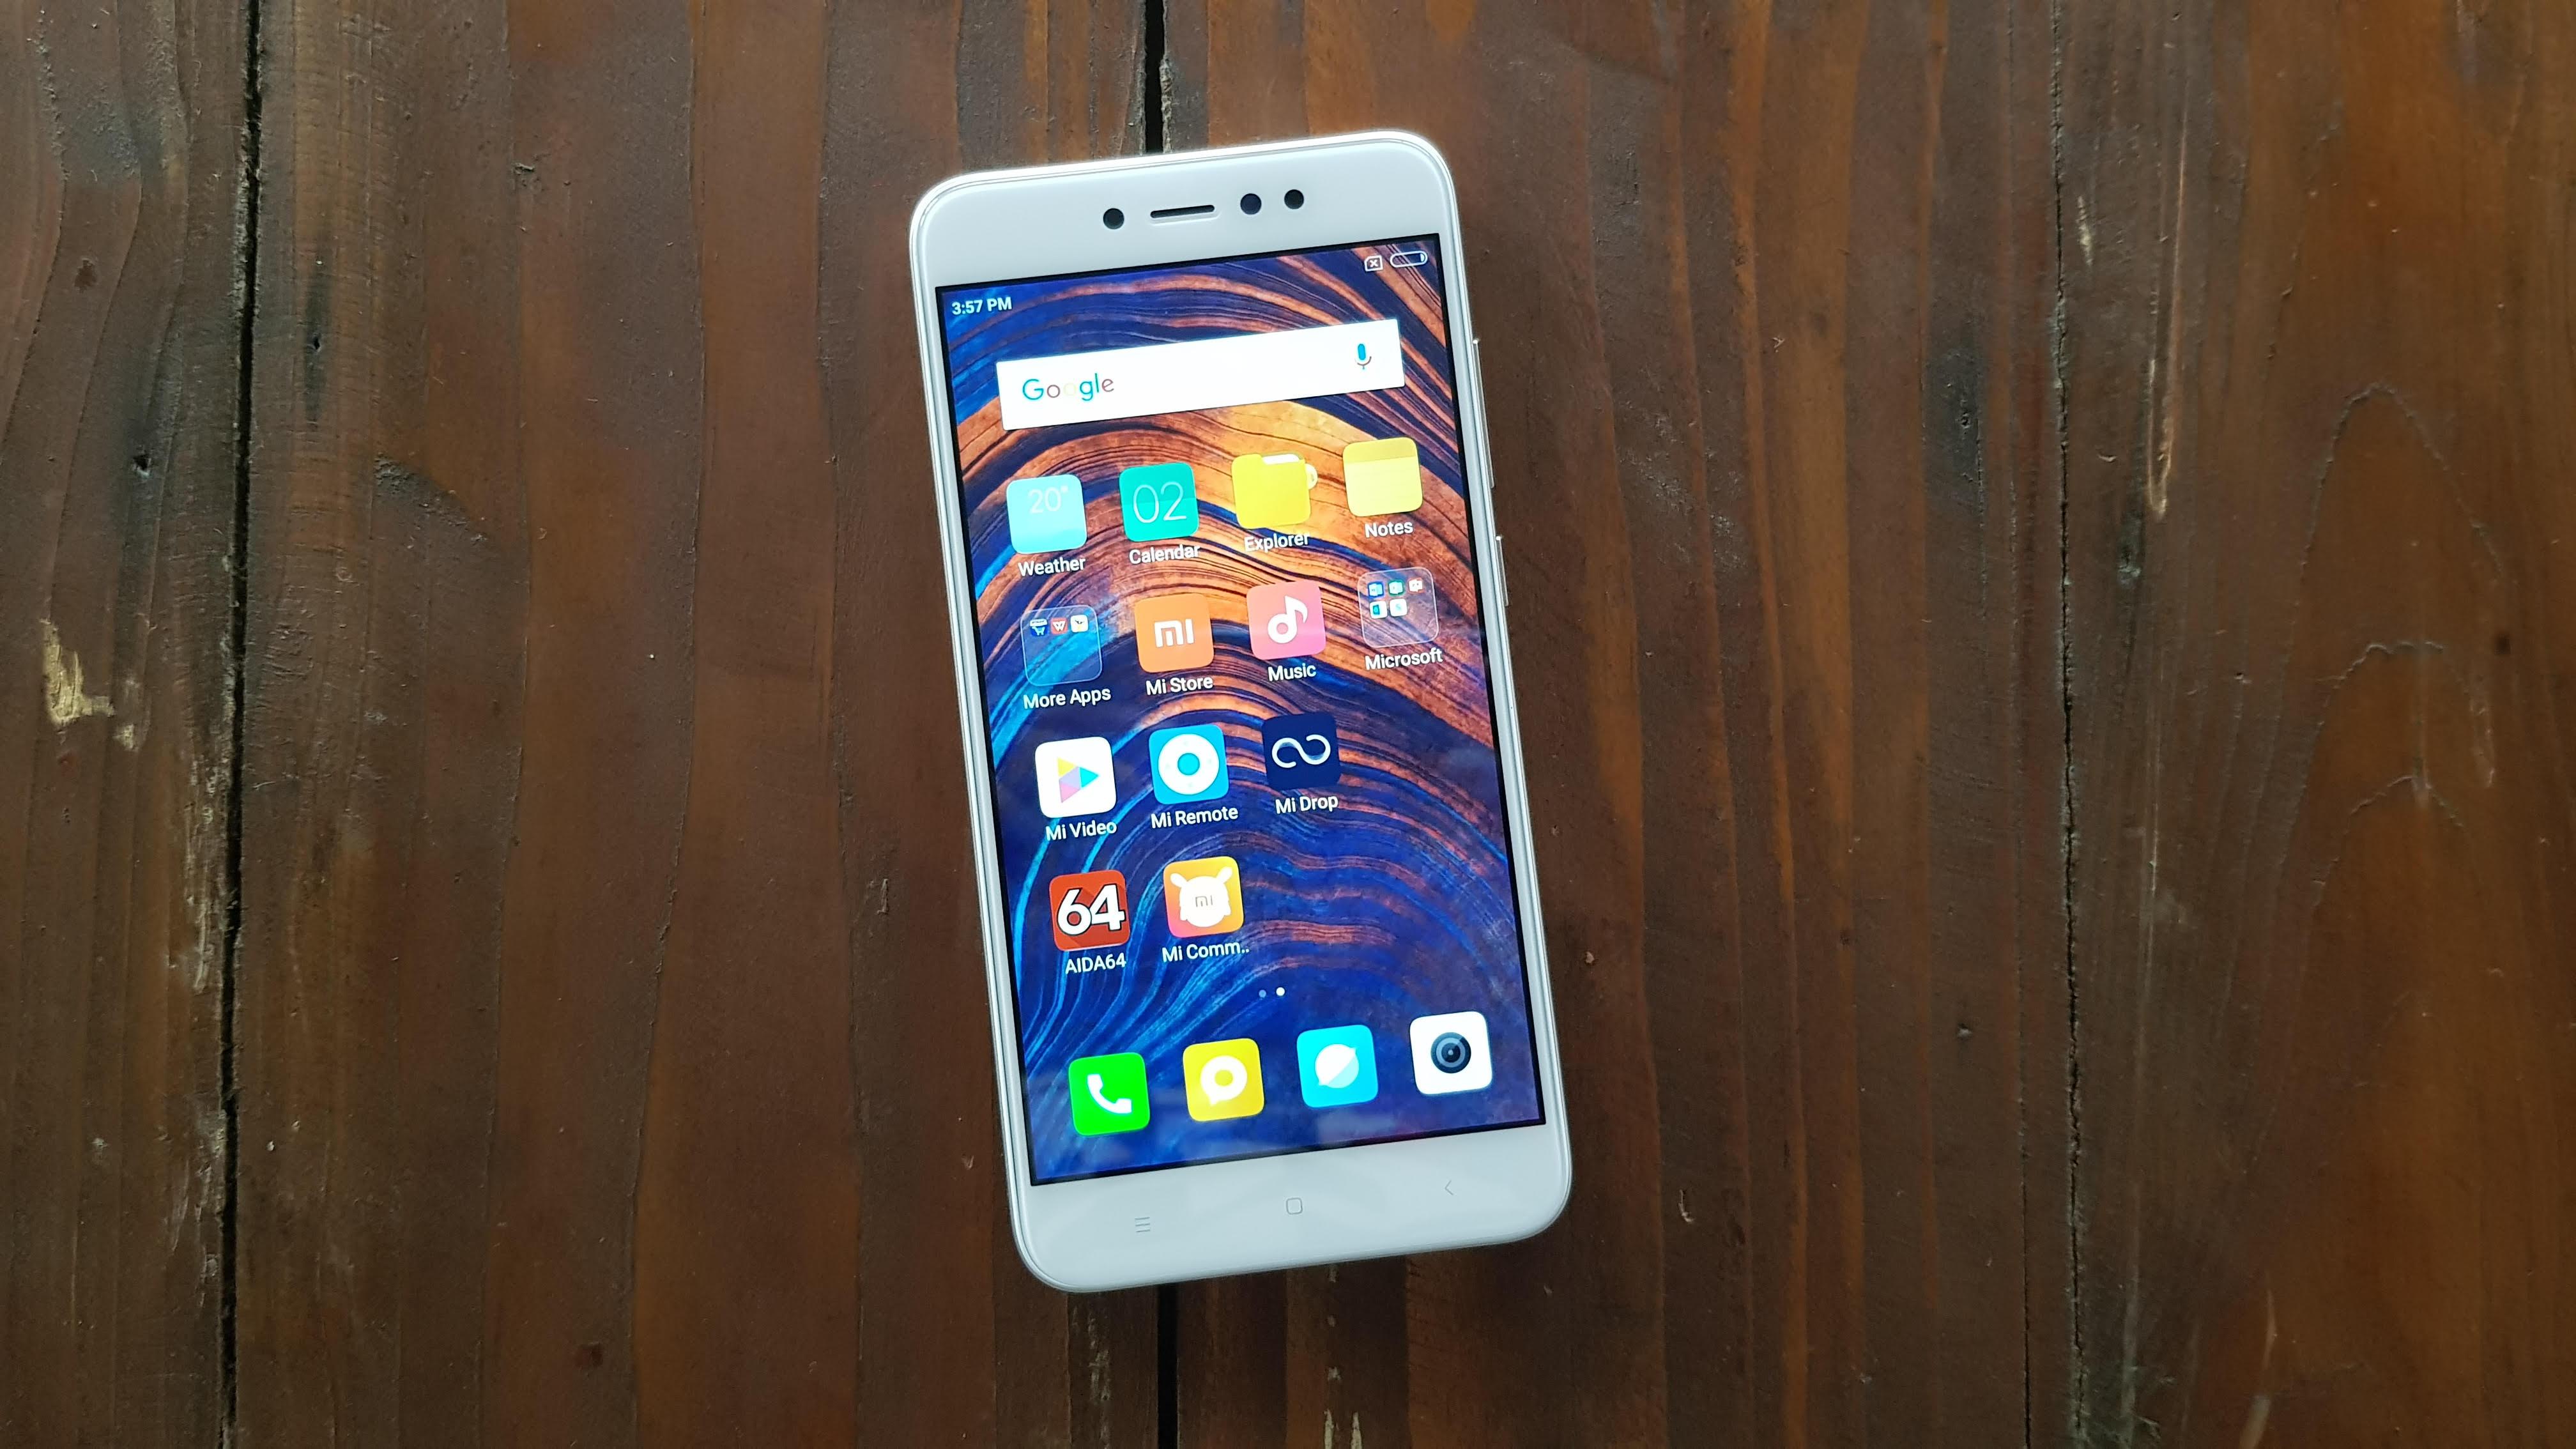 Best smartphones under 7,000 India avEag9KE64kBzRzz3mz4